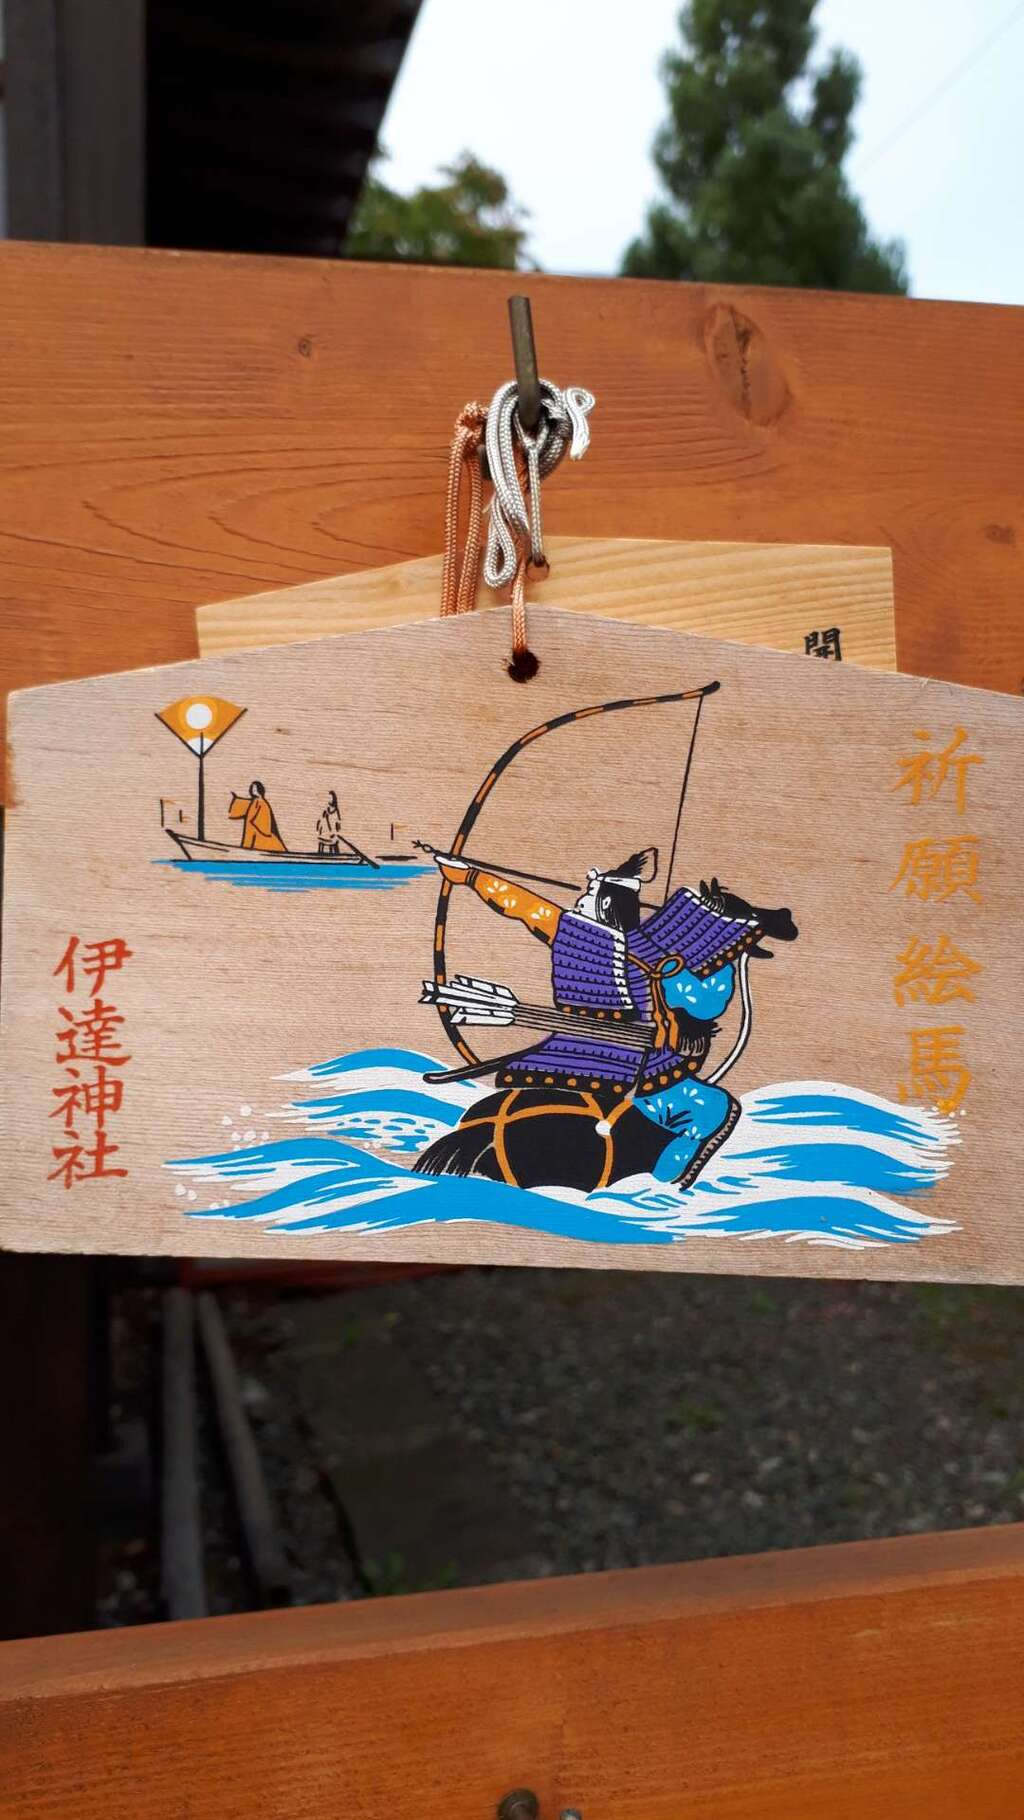 伊達神社の絵馬